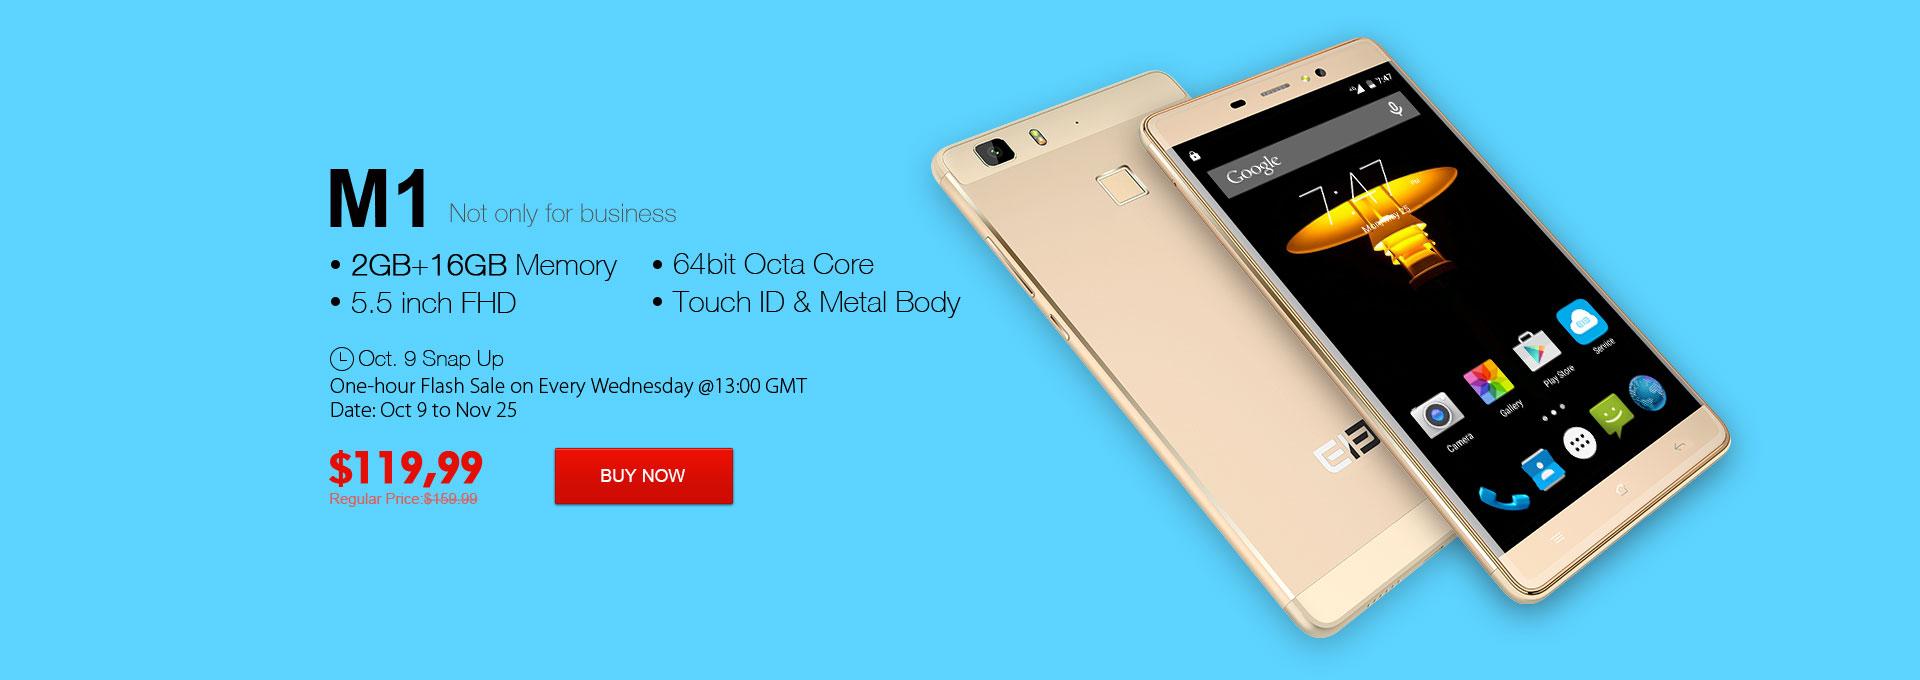 Elephone-M1-offer